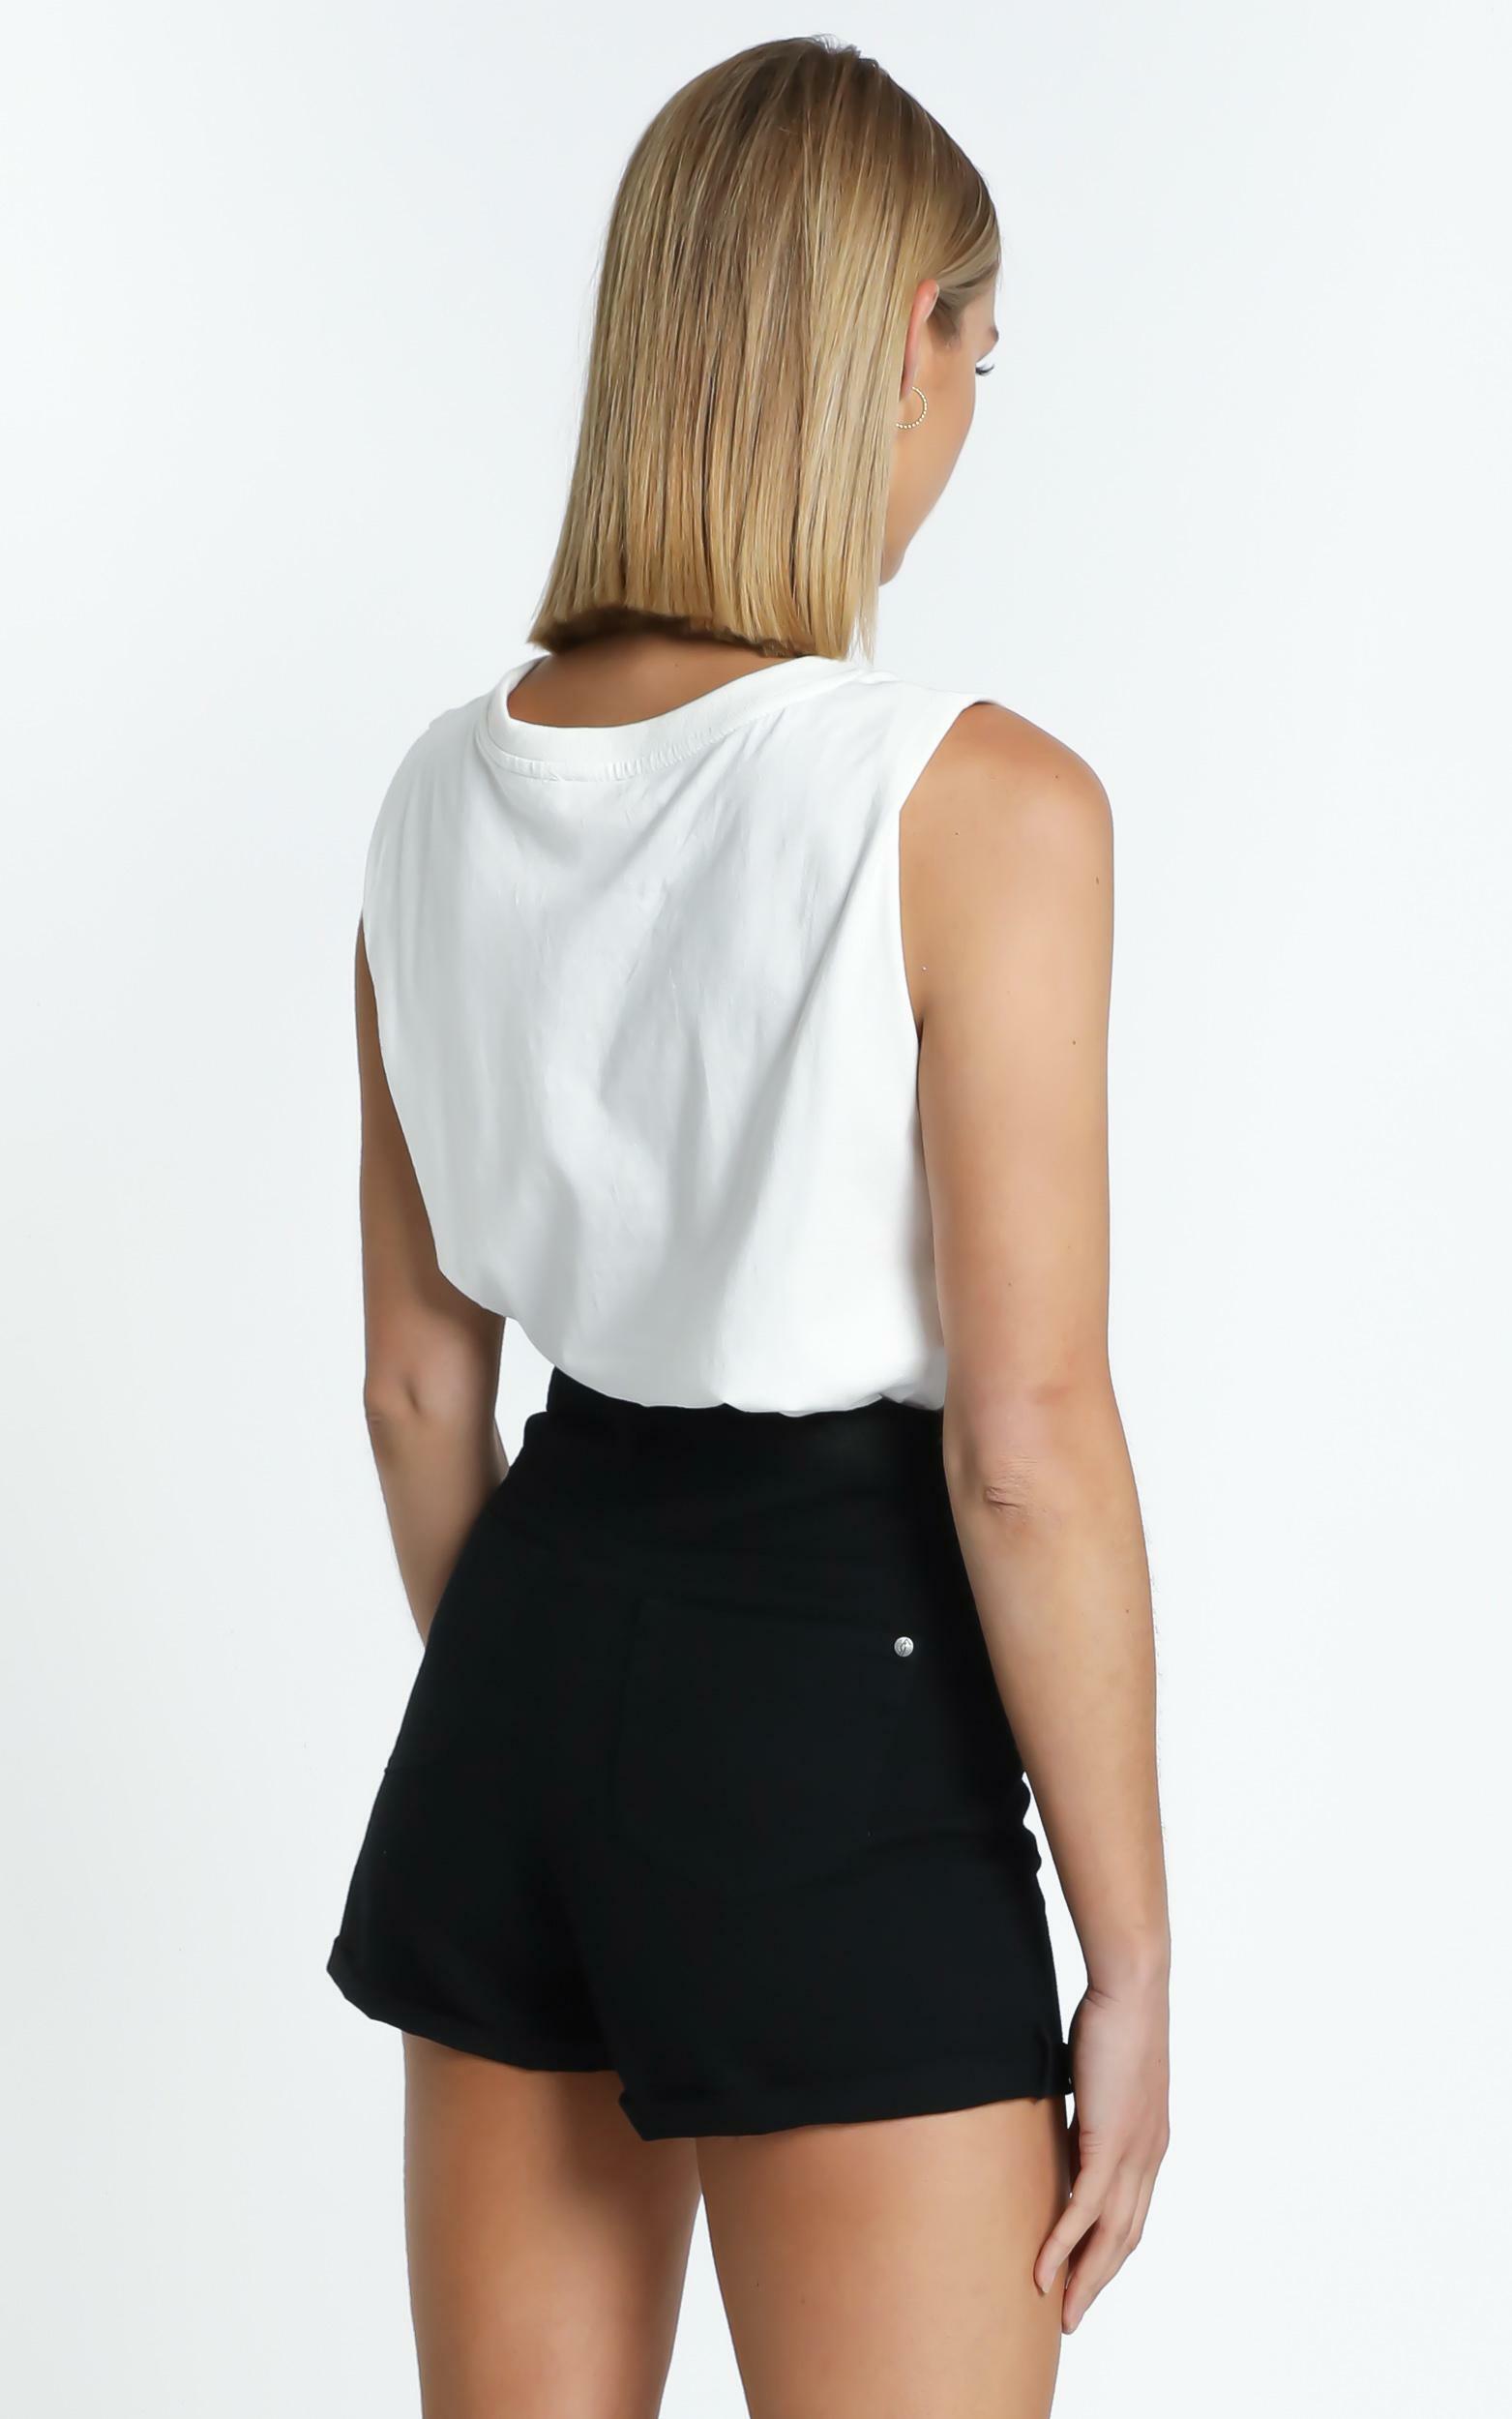 Heidi Shorts in Black - 6 (XS), Black, hi-res image number null